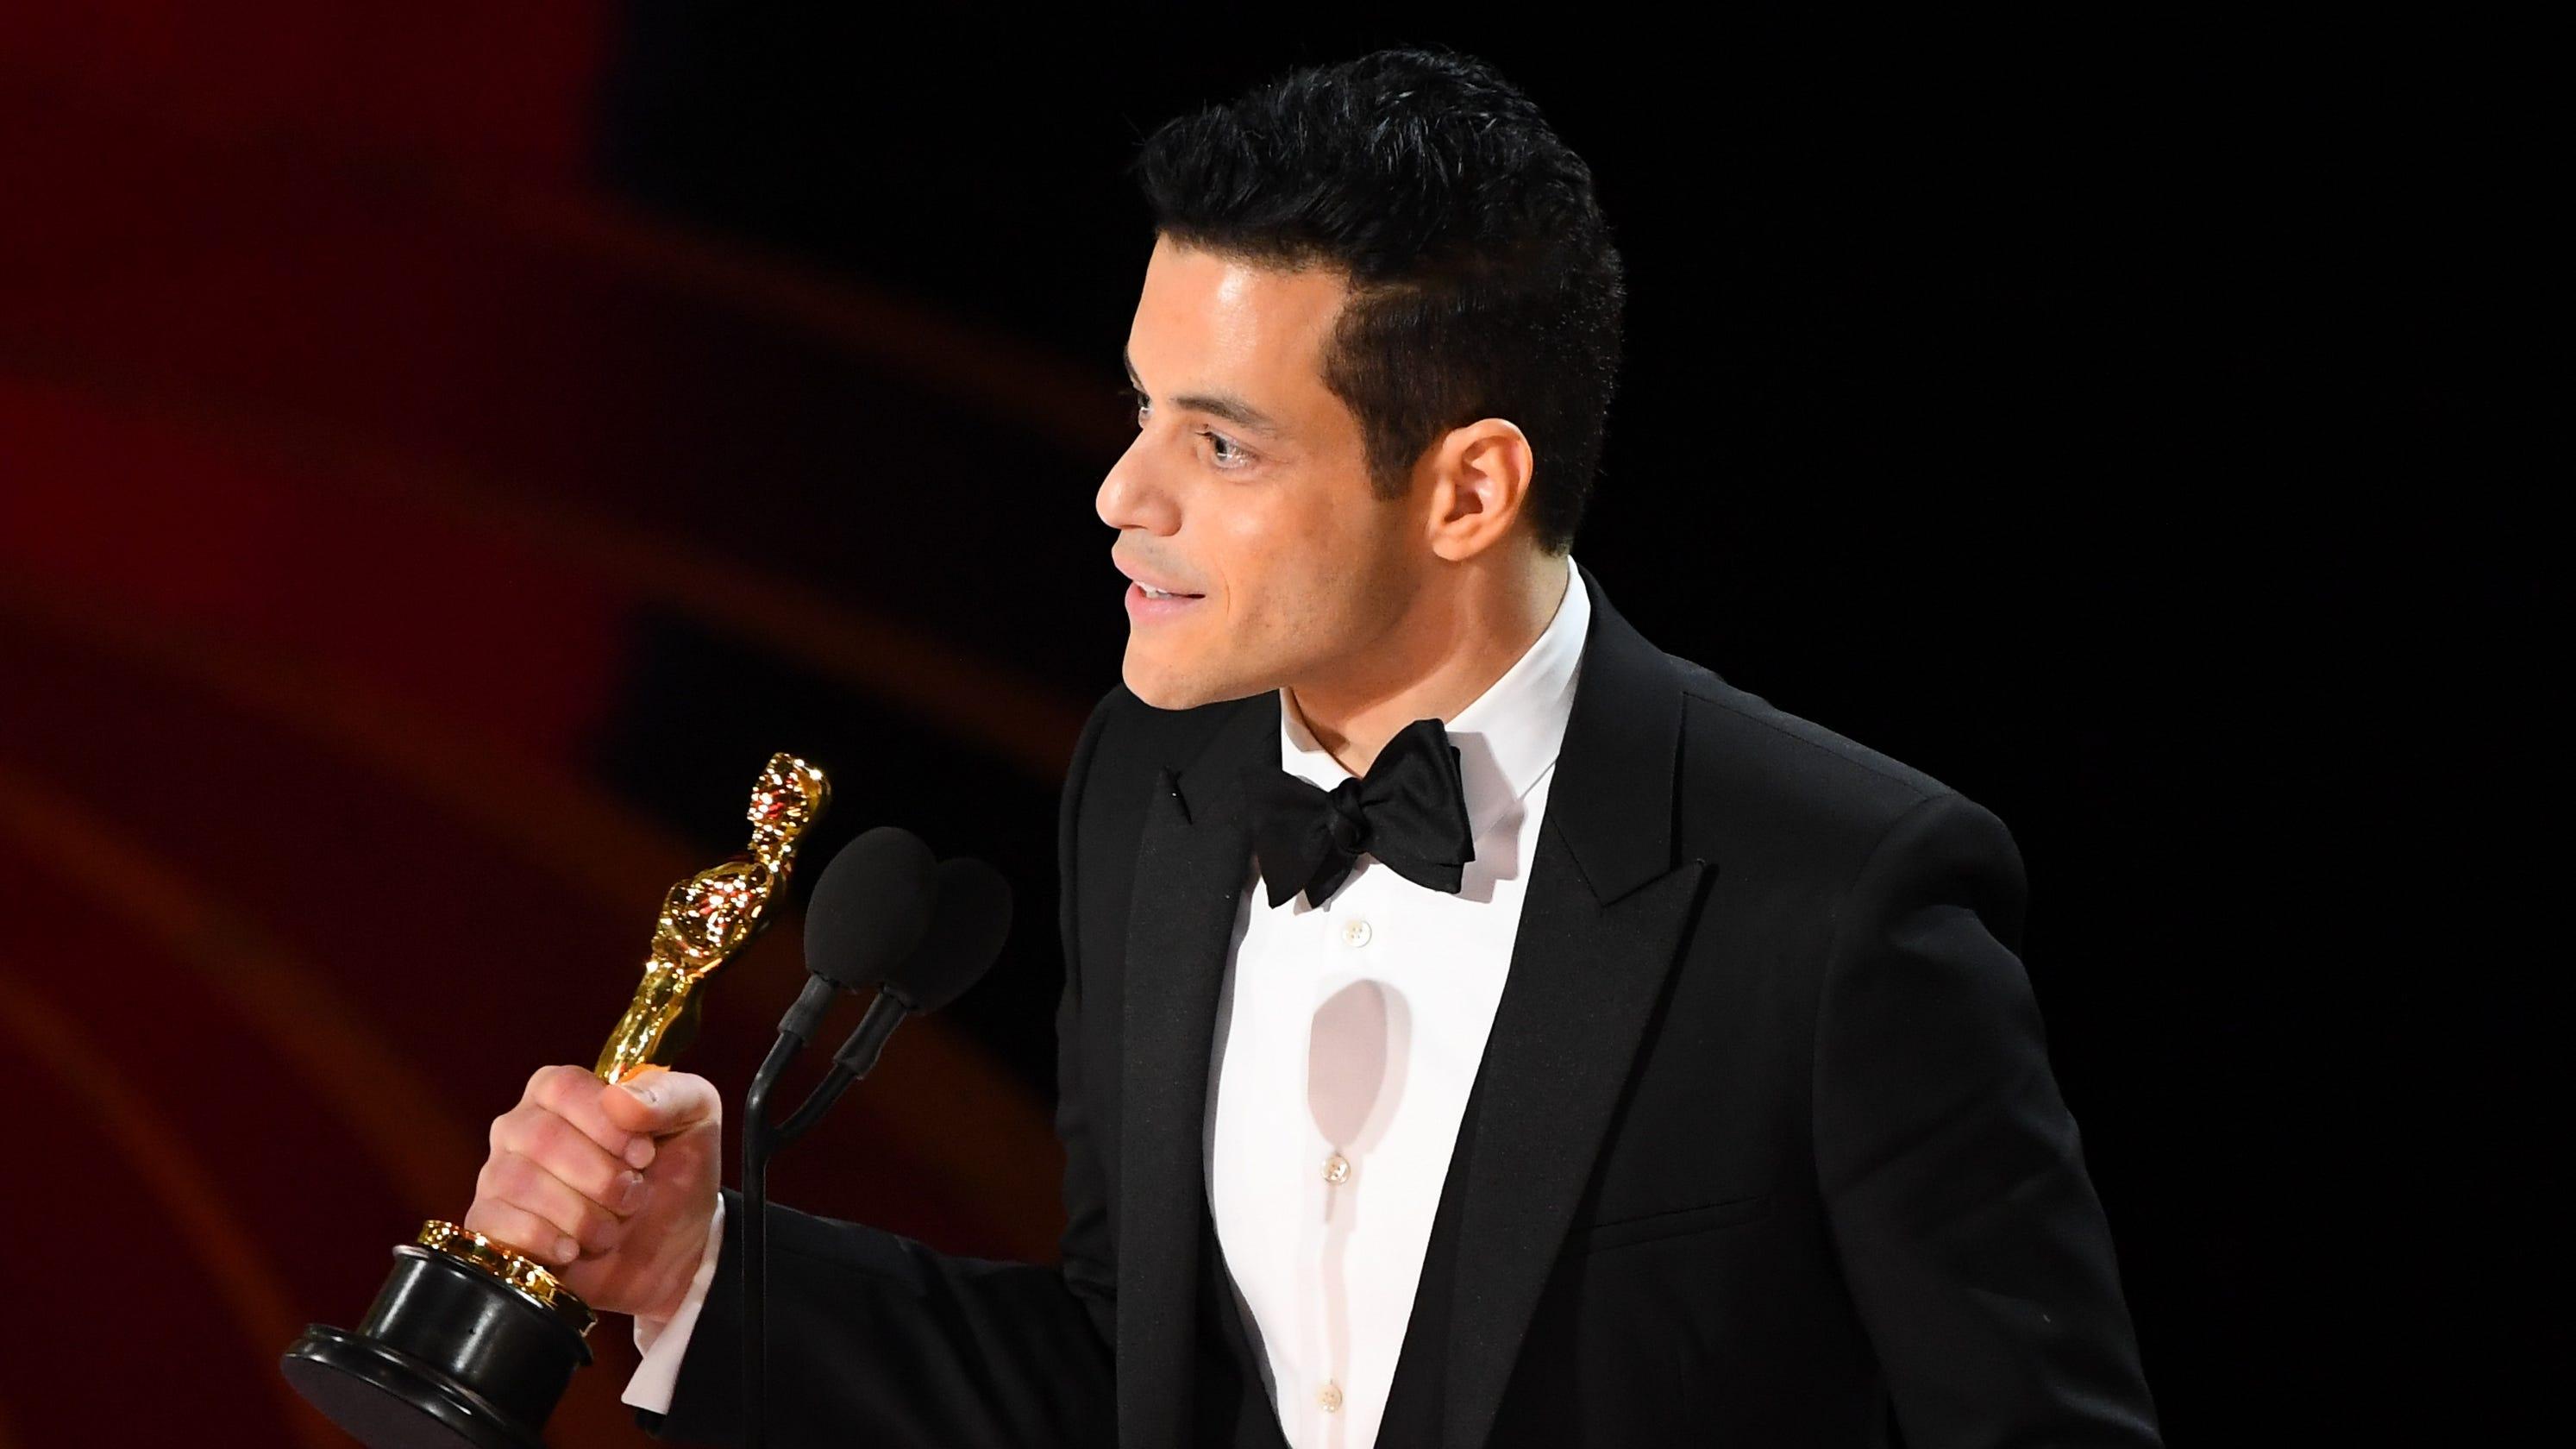 Oscars 2019: The winners list